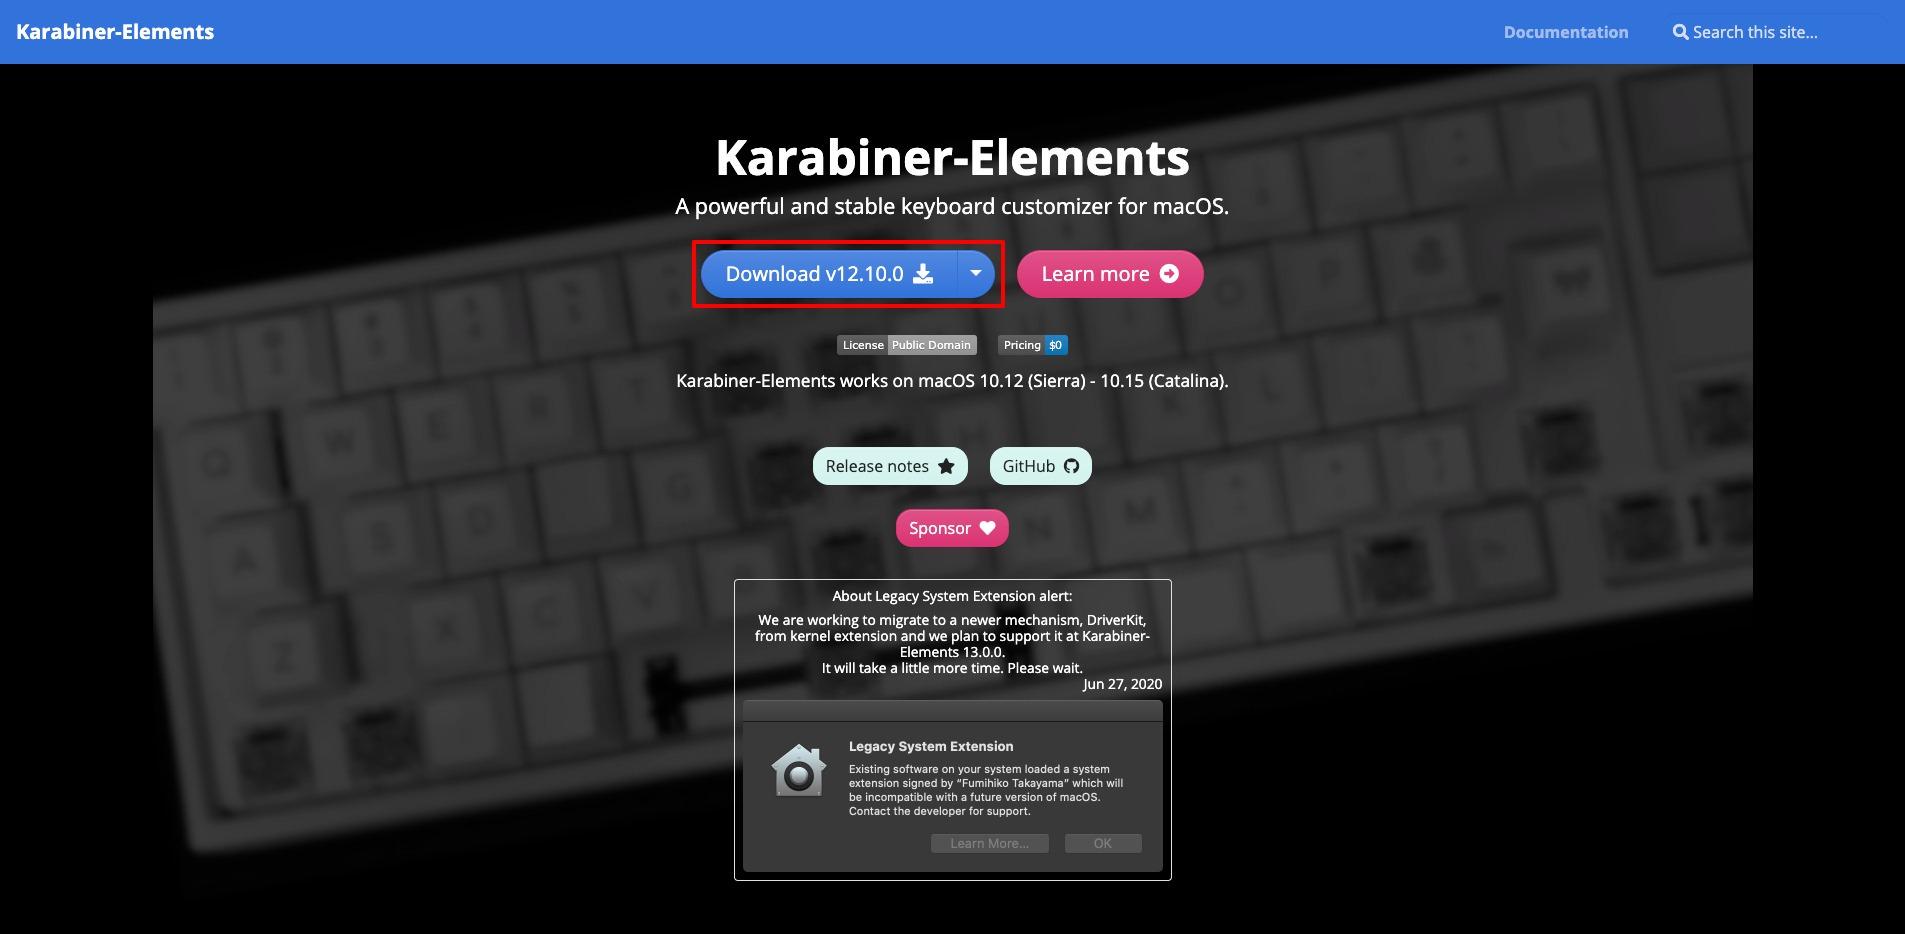 Karabiner-Elementsのインストール